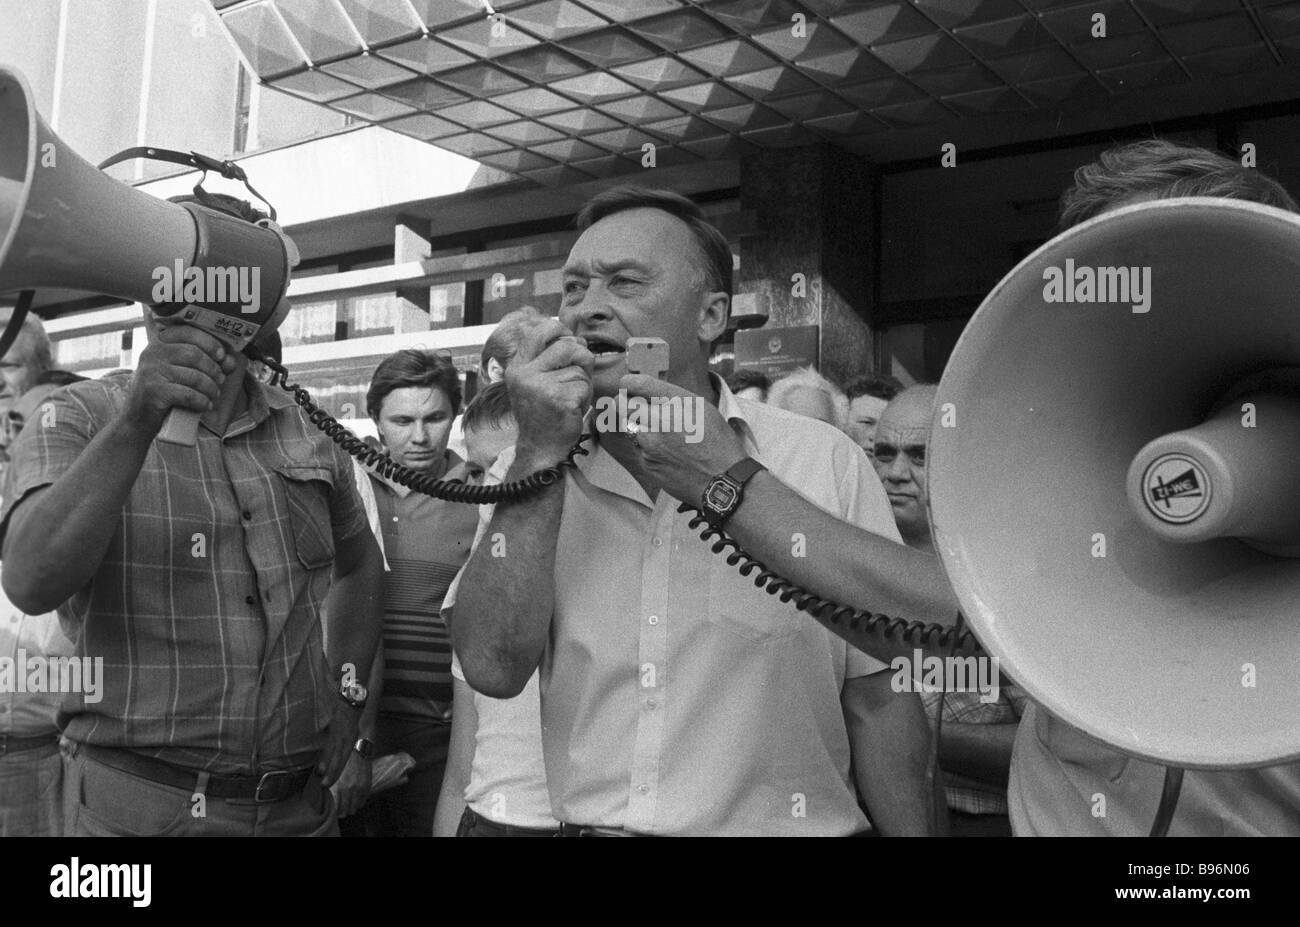 Speech by the former Soviet KGB Major General retired Oleg Kalugin at the rally in Krasnodar on the occasion of - Stock Image